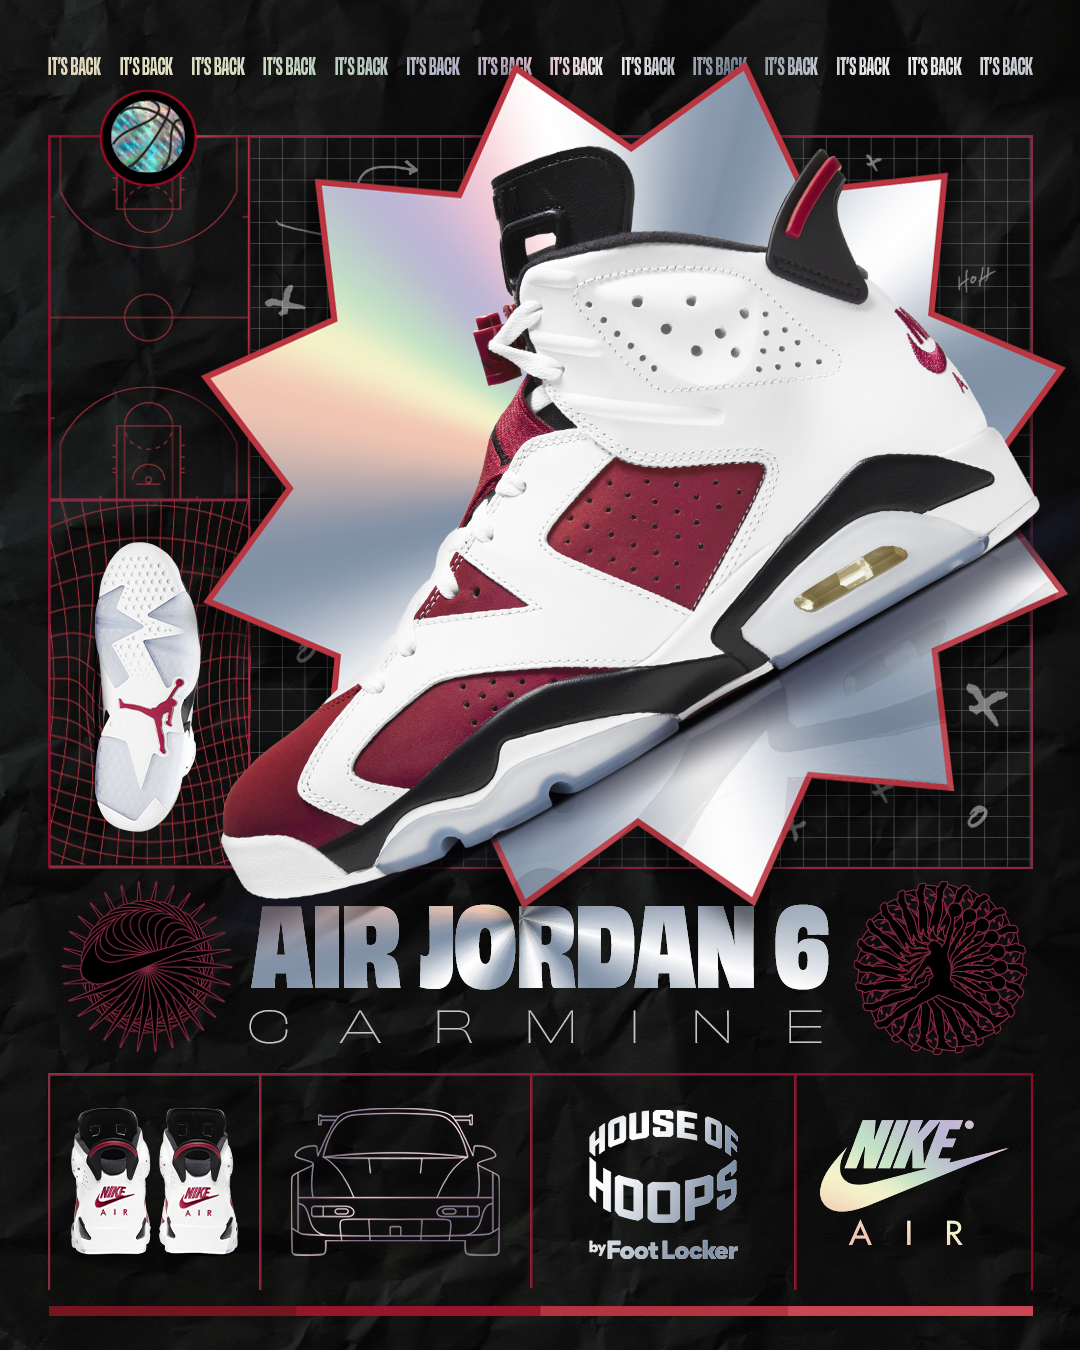 Air-Jordan-6-Carmine-4×5-Portfolio-Web